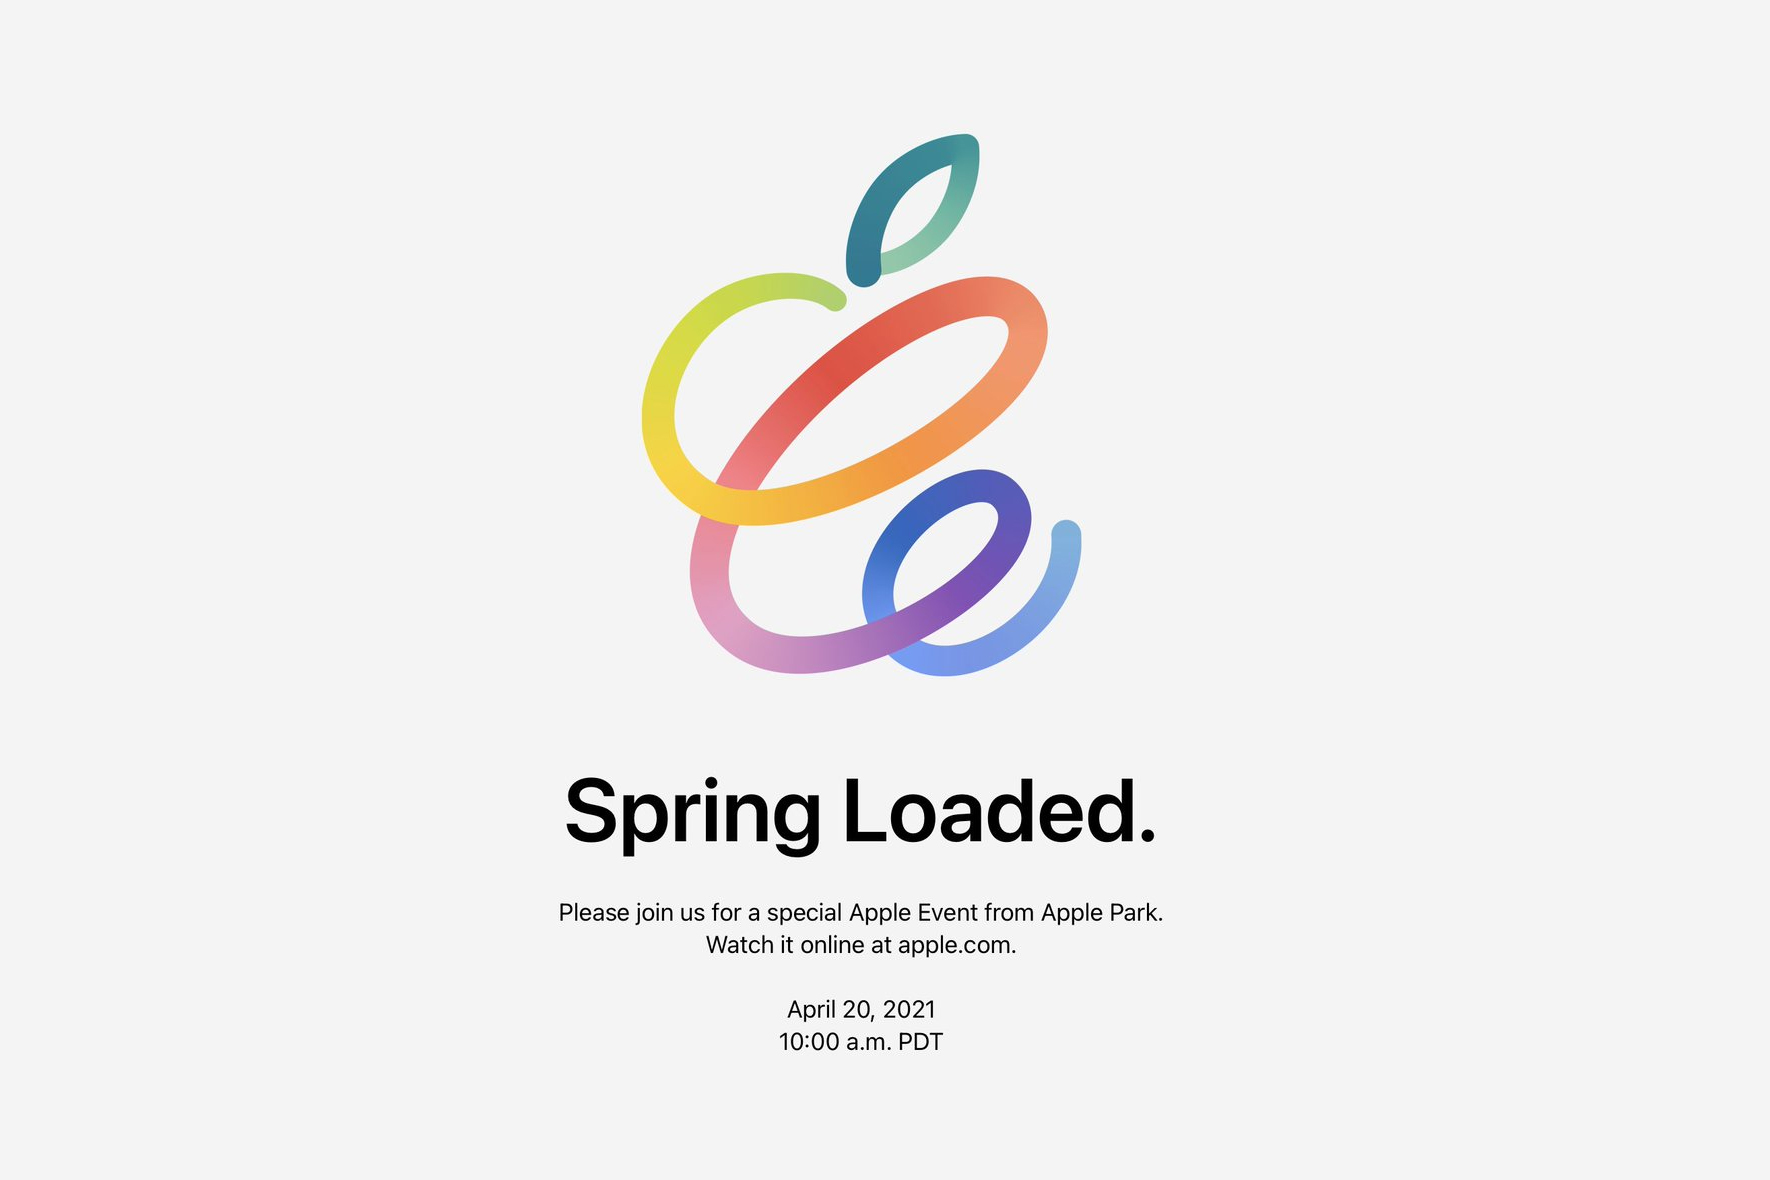 Apple Spring Loaded 2021